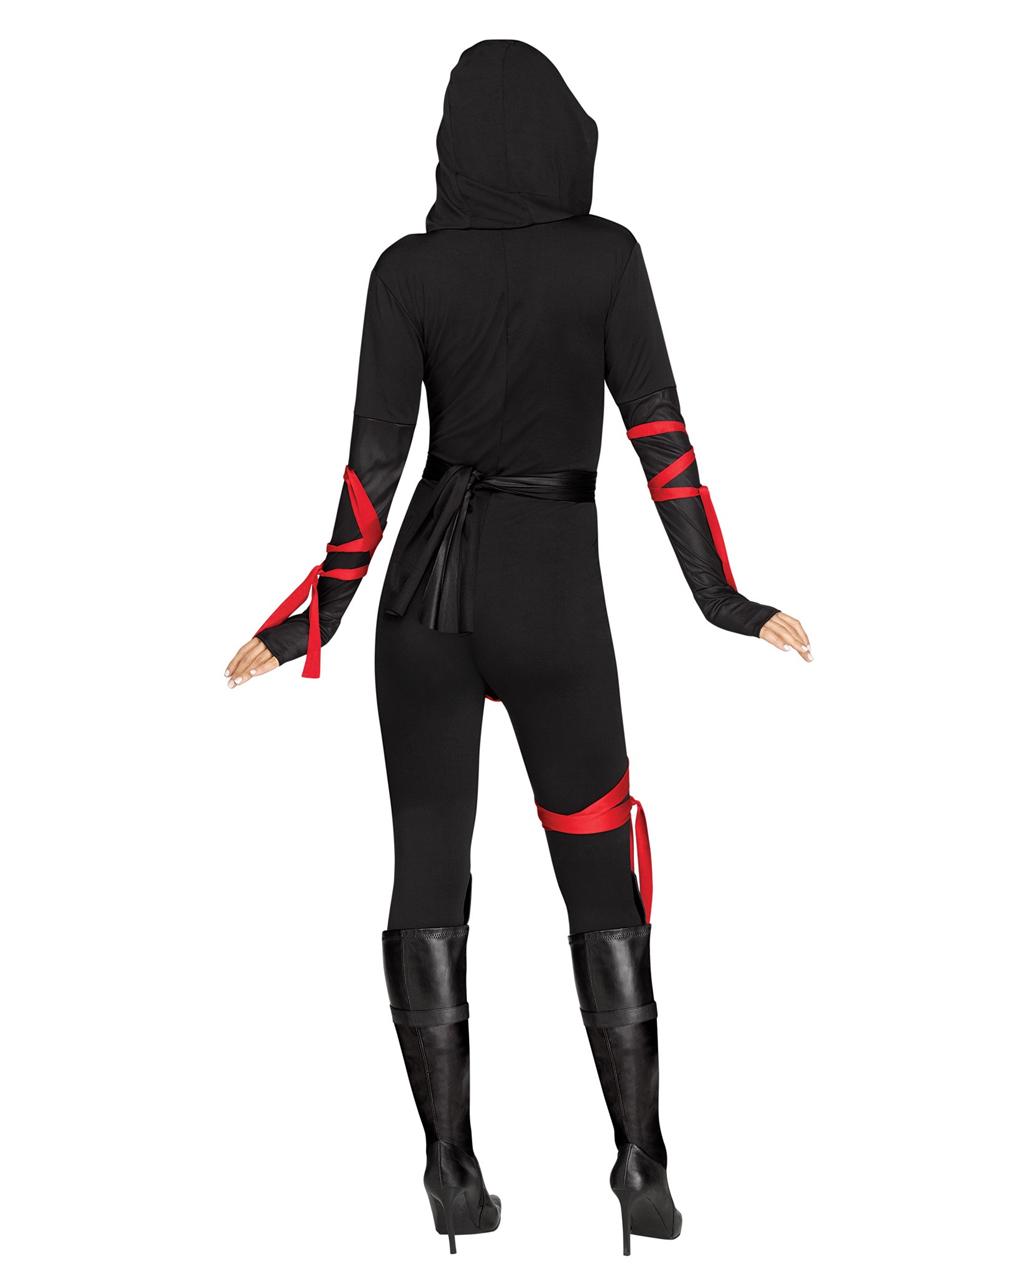 ninja kriegerin frauenkost m f r karneval karneval universe. Black Bedroom Furniture Sets. Home Design Ideas